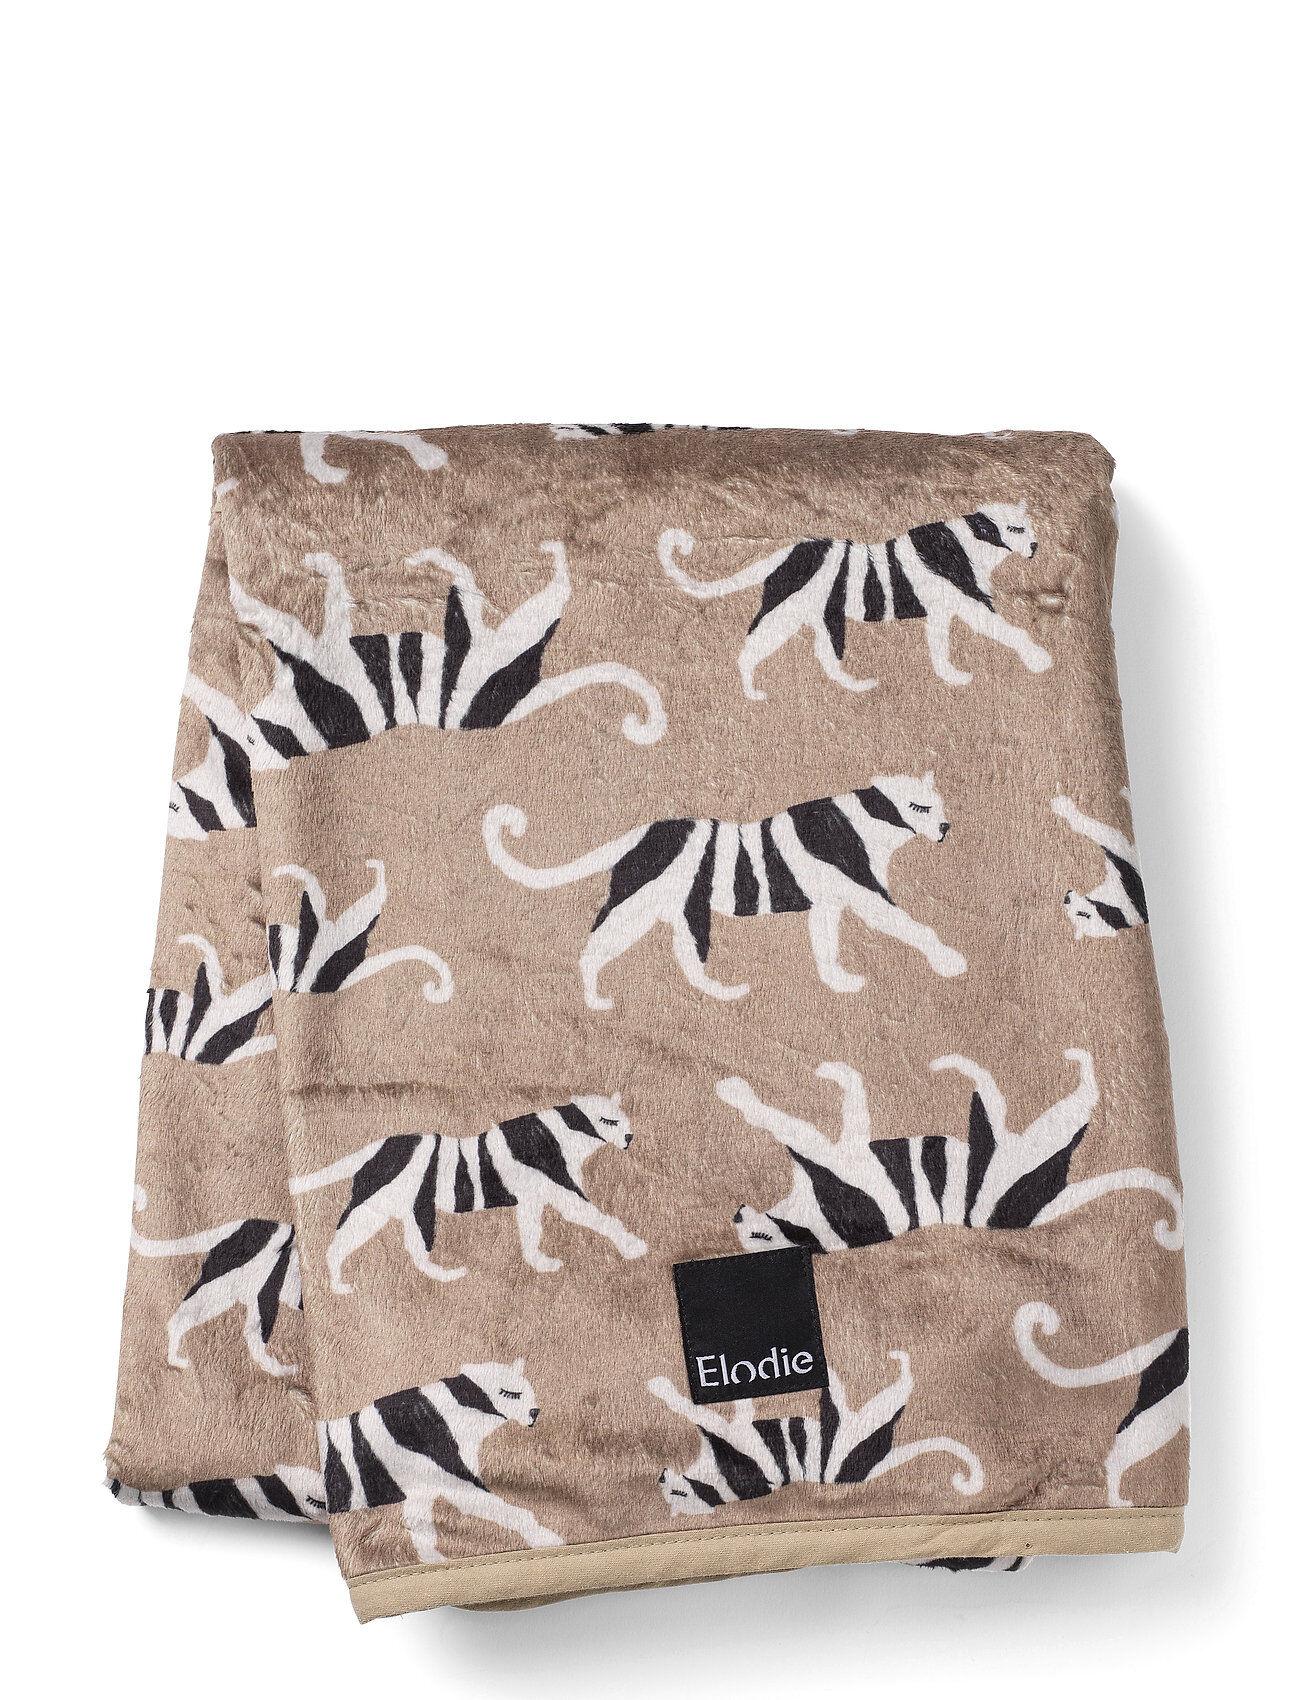 Elodie Details Pearl Velvet Blanket - White Tiger Warm Sand Home Sleep Time Blankets & Quilts Beige Elodie Details